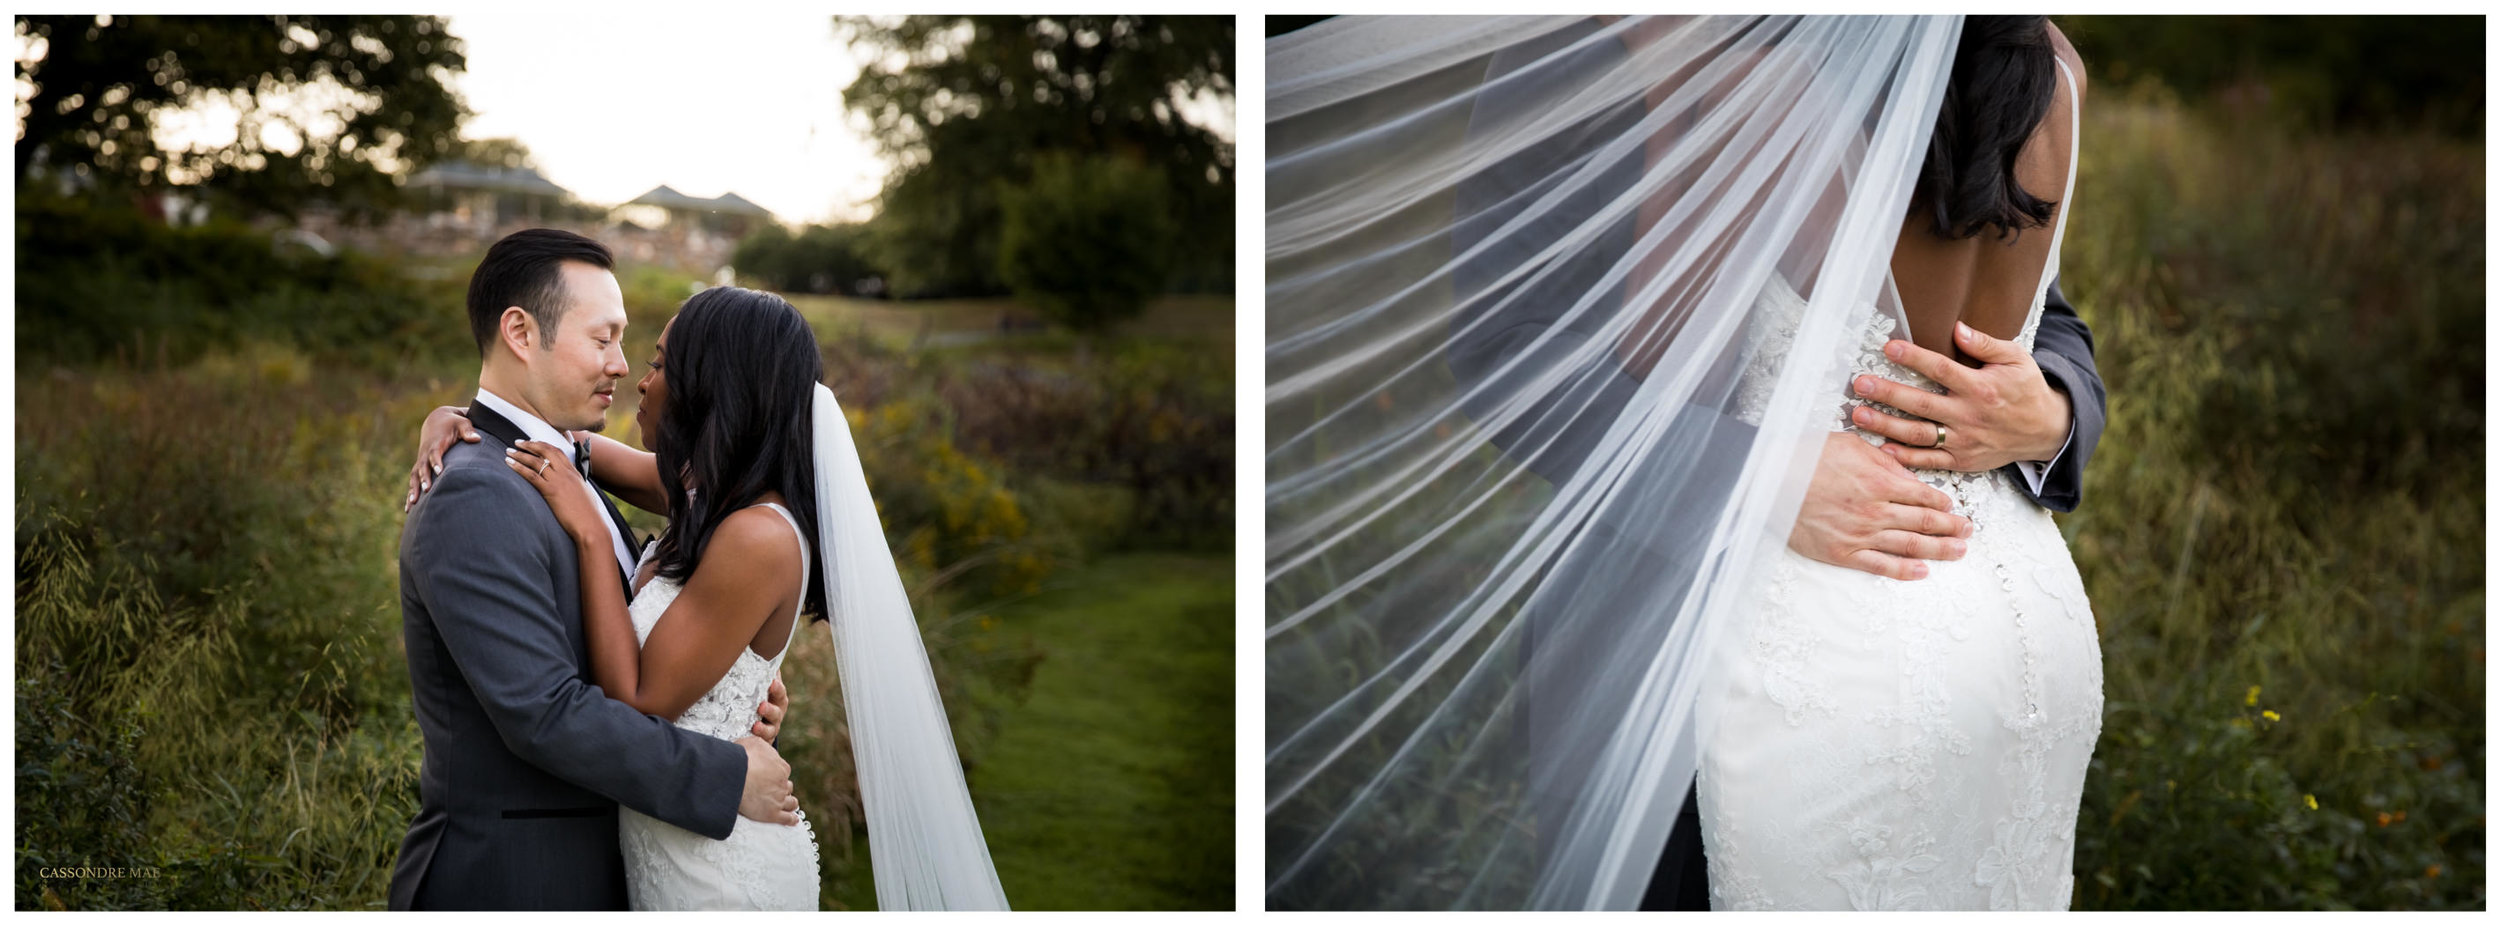 West Hills Country Club Wedding Photos Cassondre Mae Photography 17.jpg